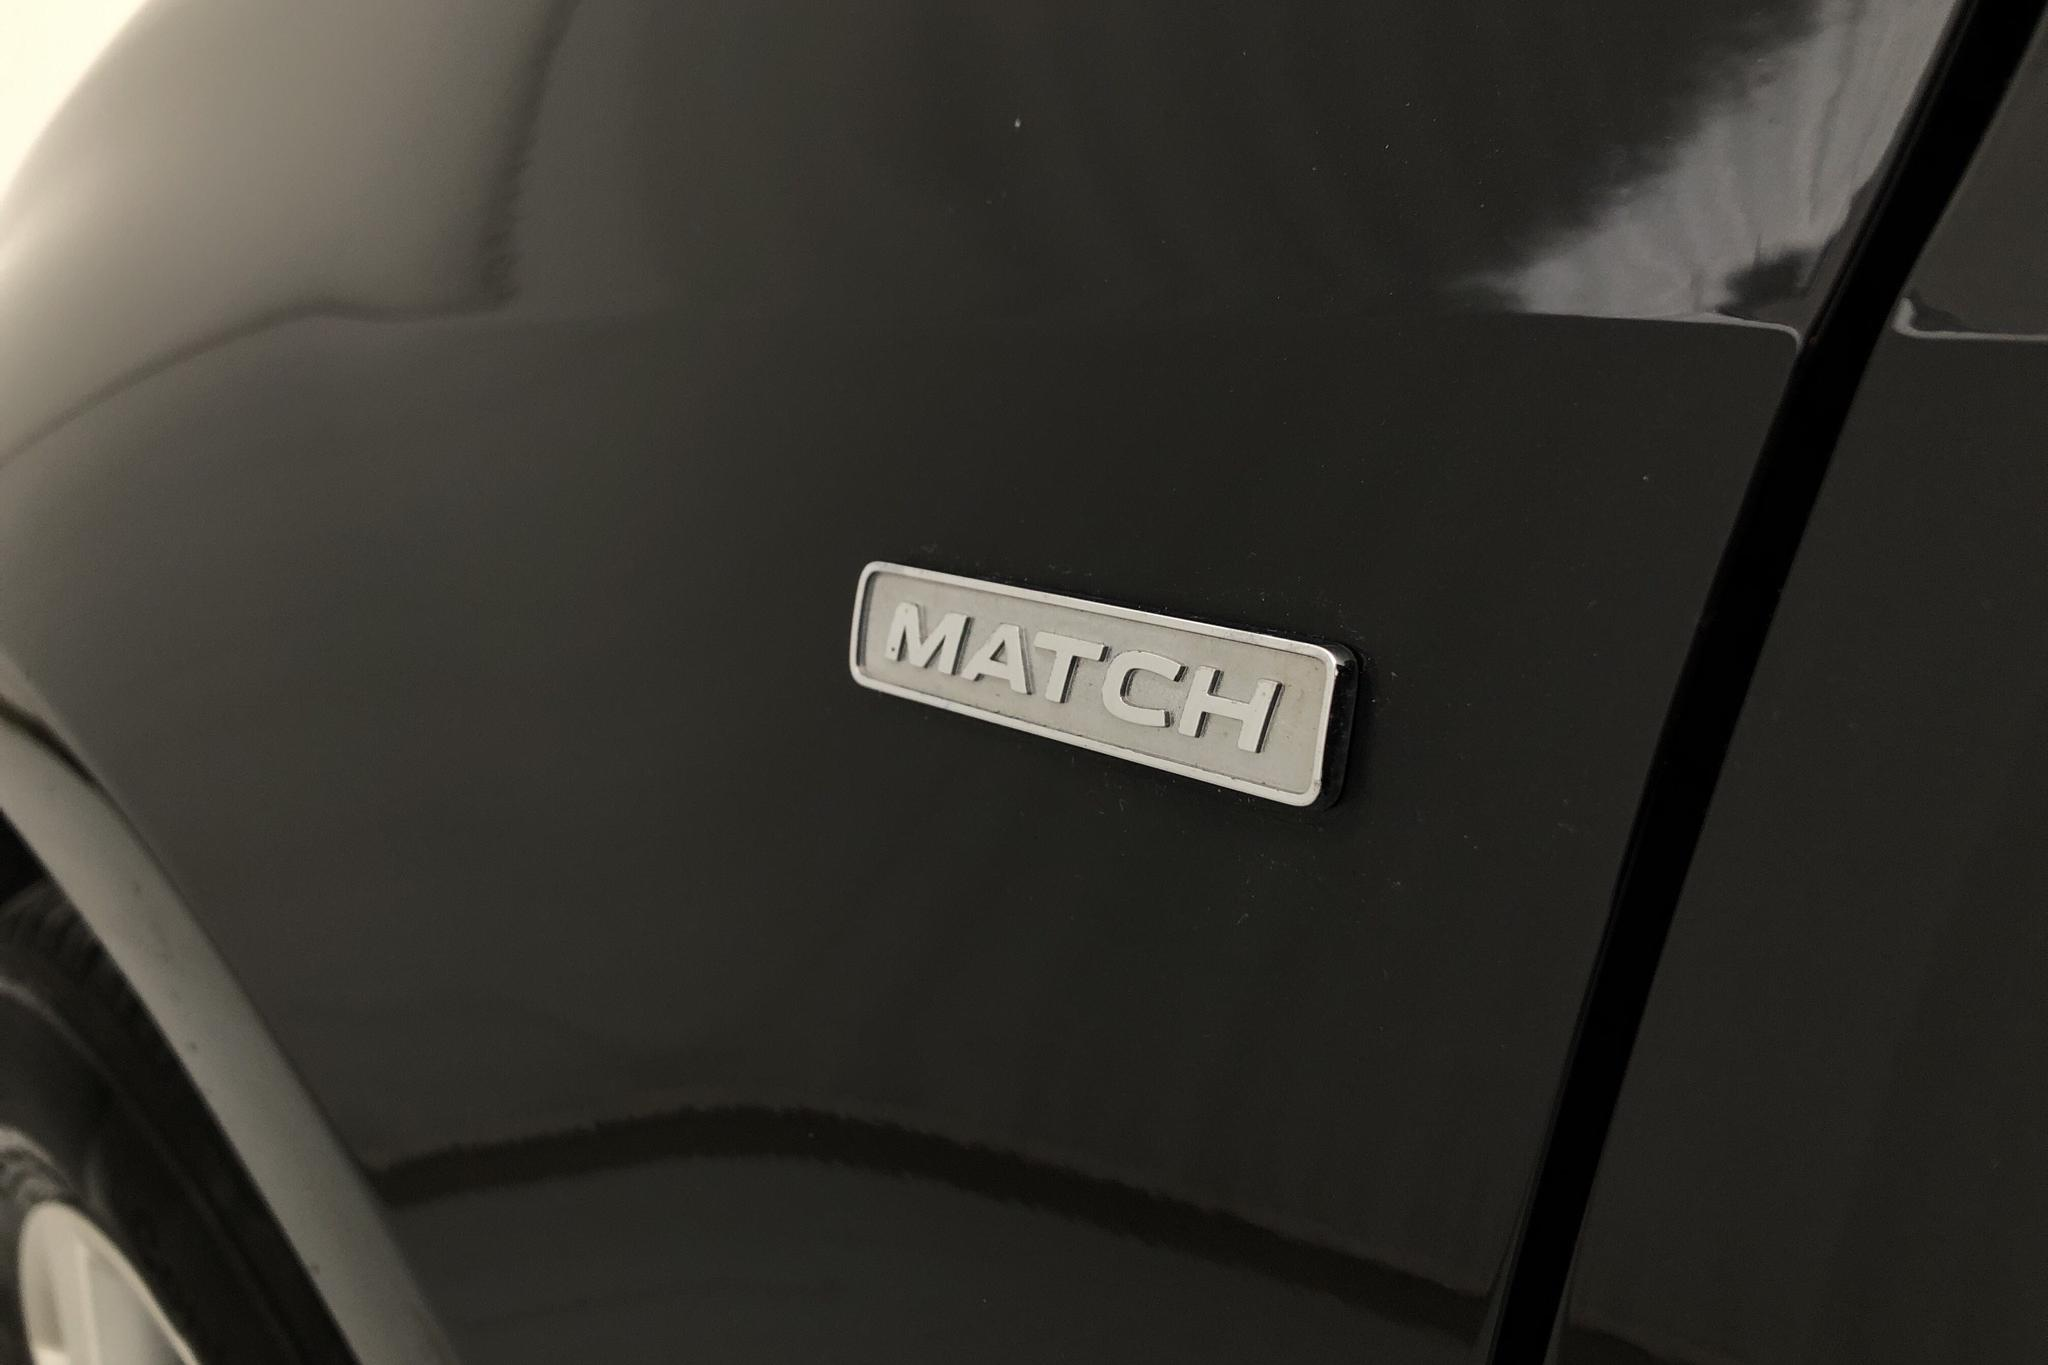 VW Golf VI 1.6 TDI BlueMotion 5dr (105hk) - 164 810 km - Manual - black - 2012